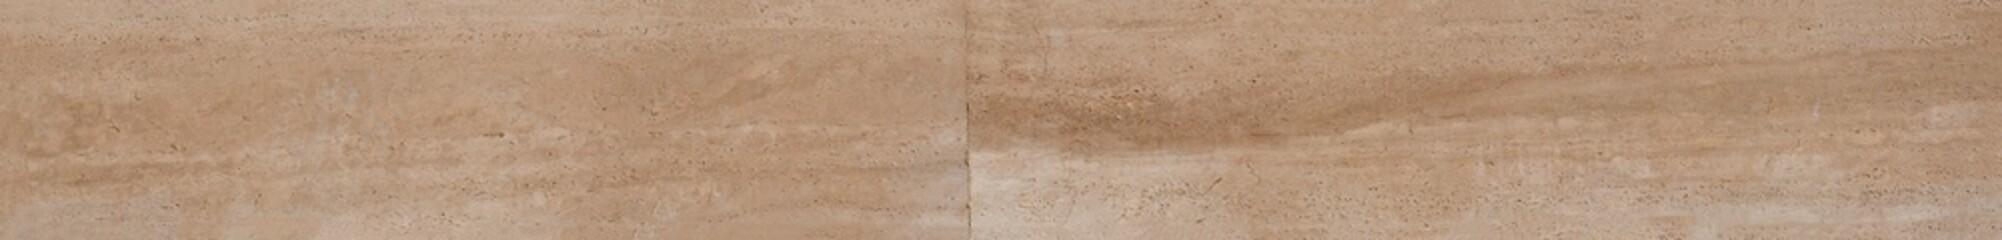 Details of sandstone texture background closeup on several long tiles